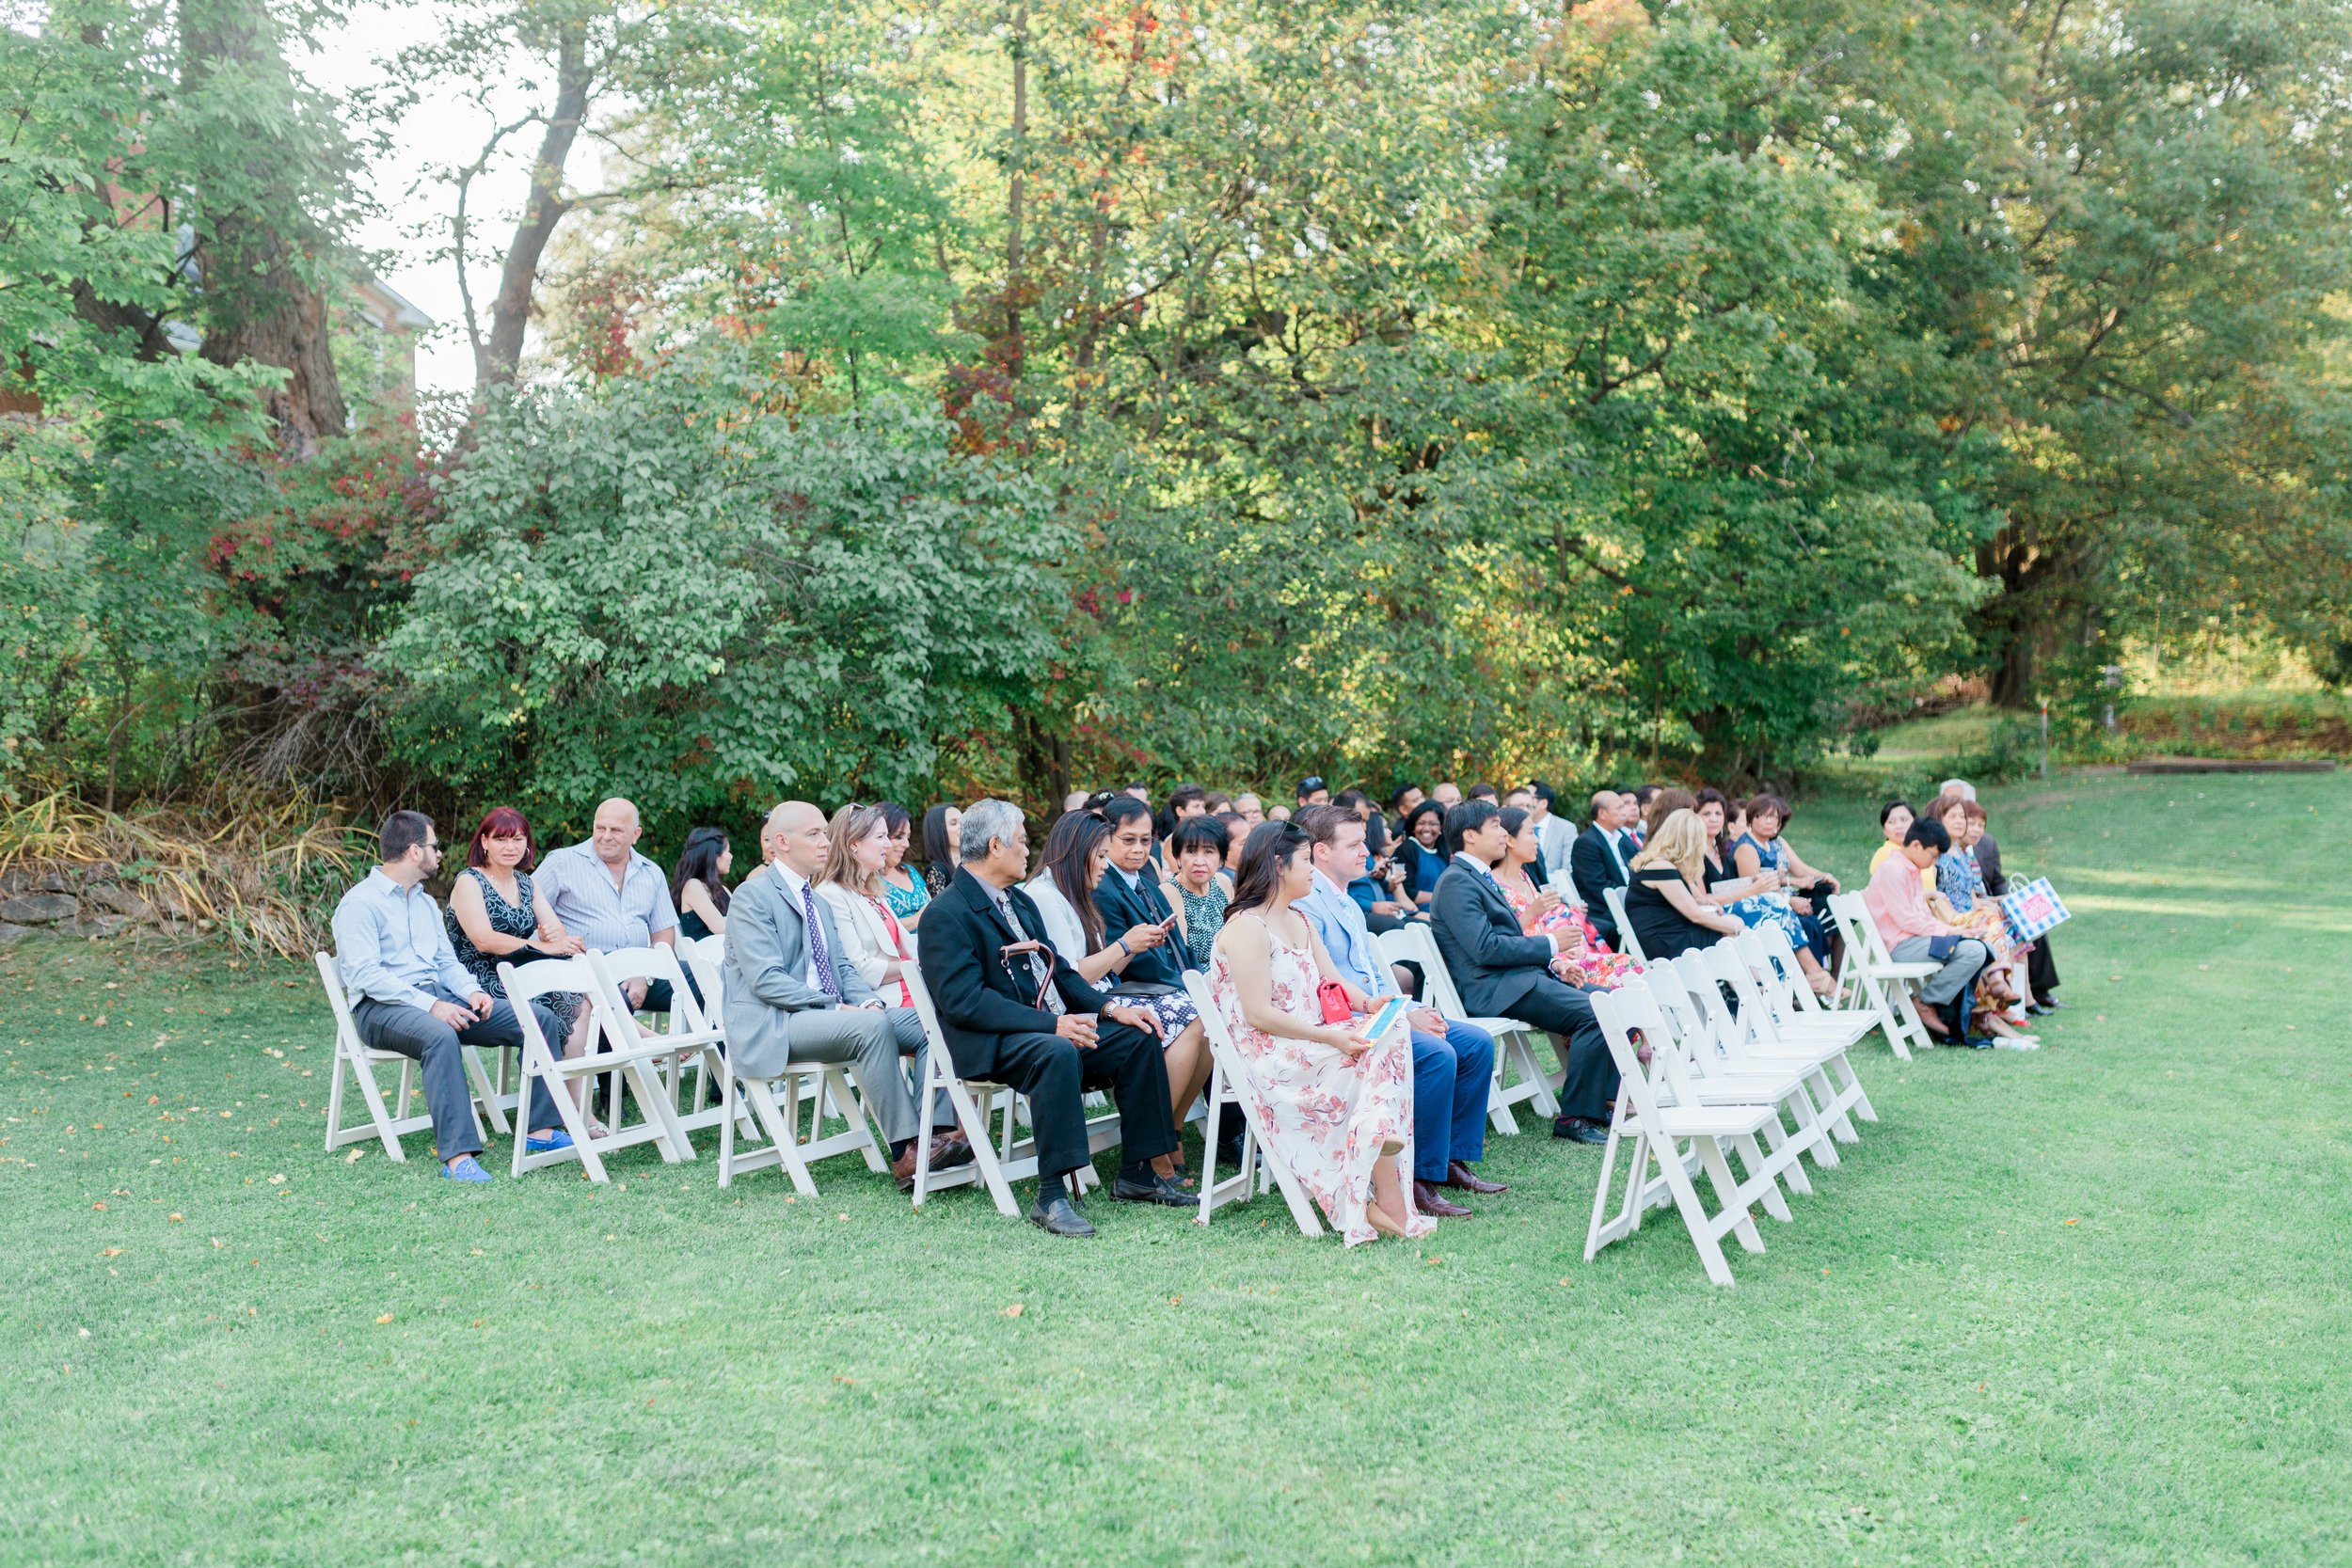 Alton Mills Wedding - Ceremony-24.jpg